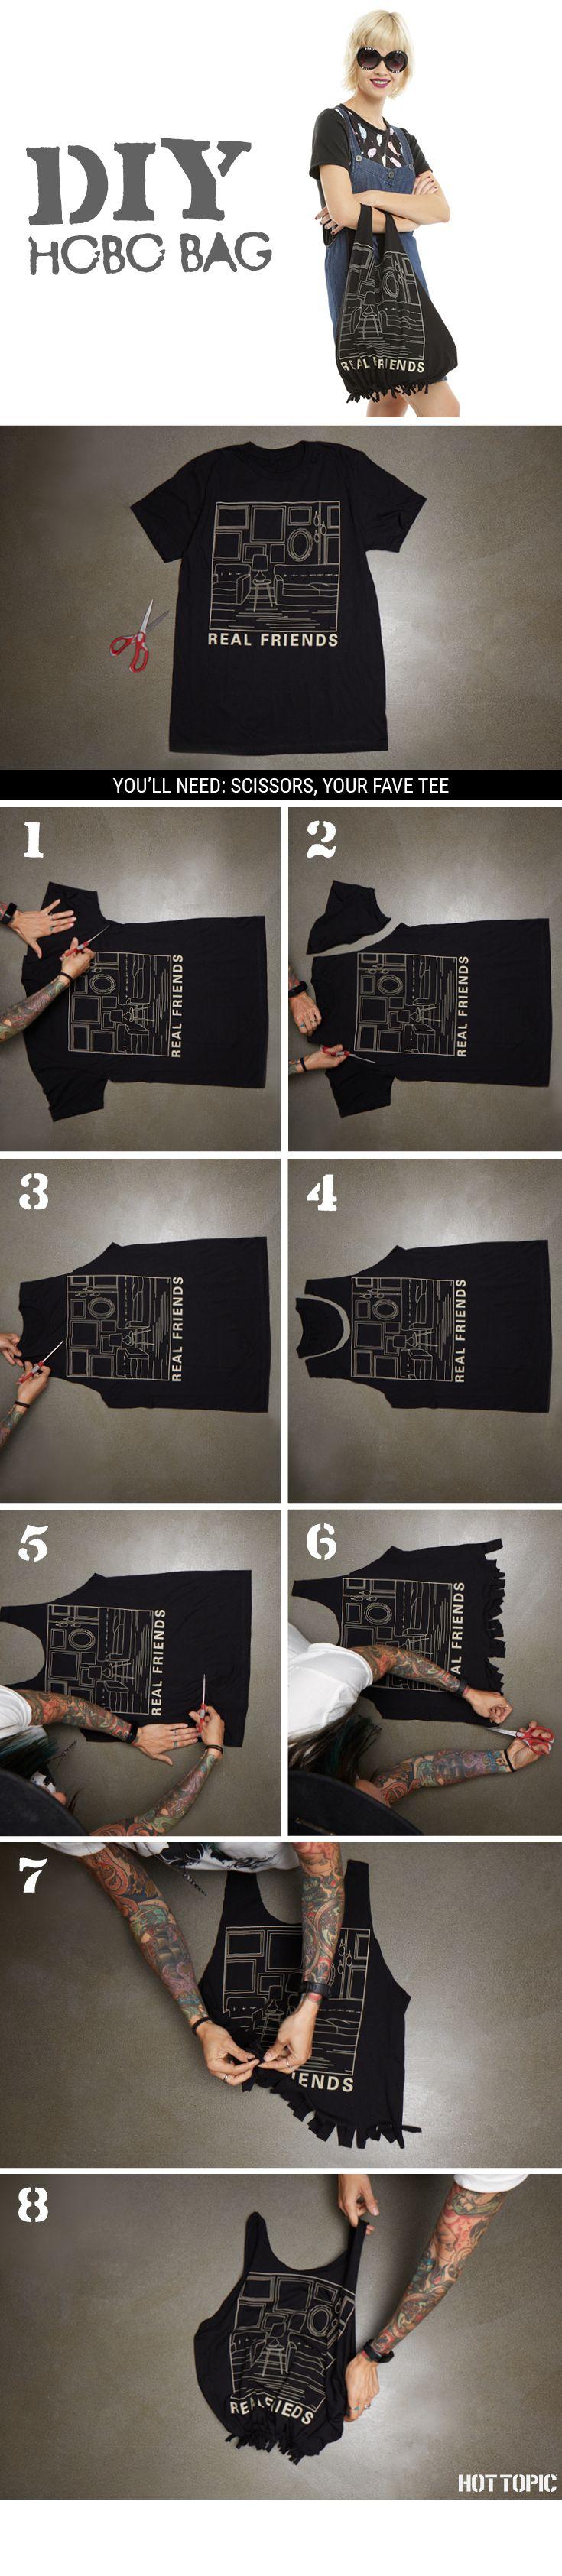 Bag envy. // DIY Hobo Bag                                                                                                                                                                                 More